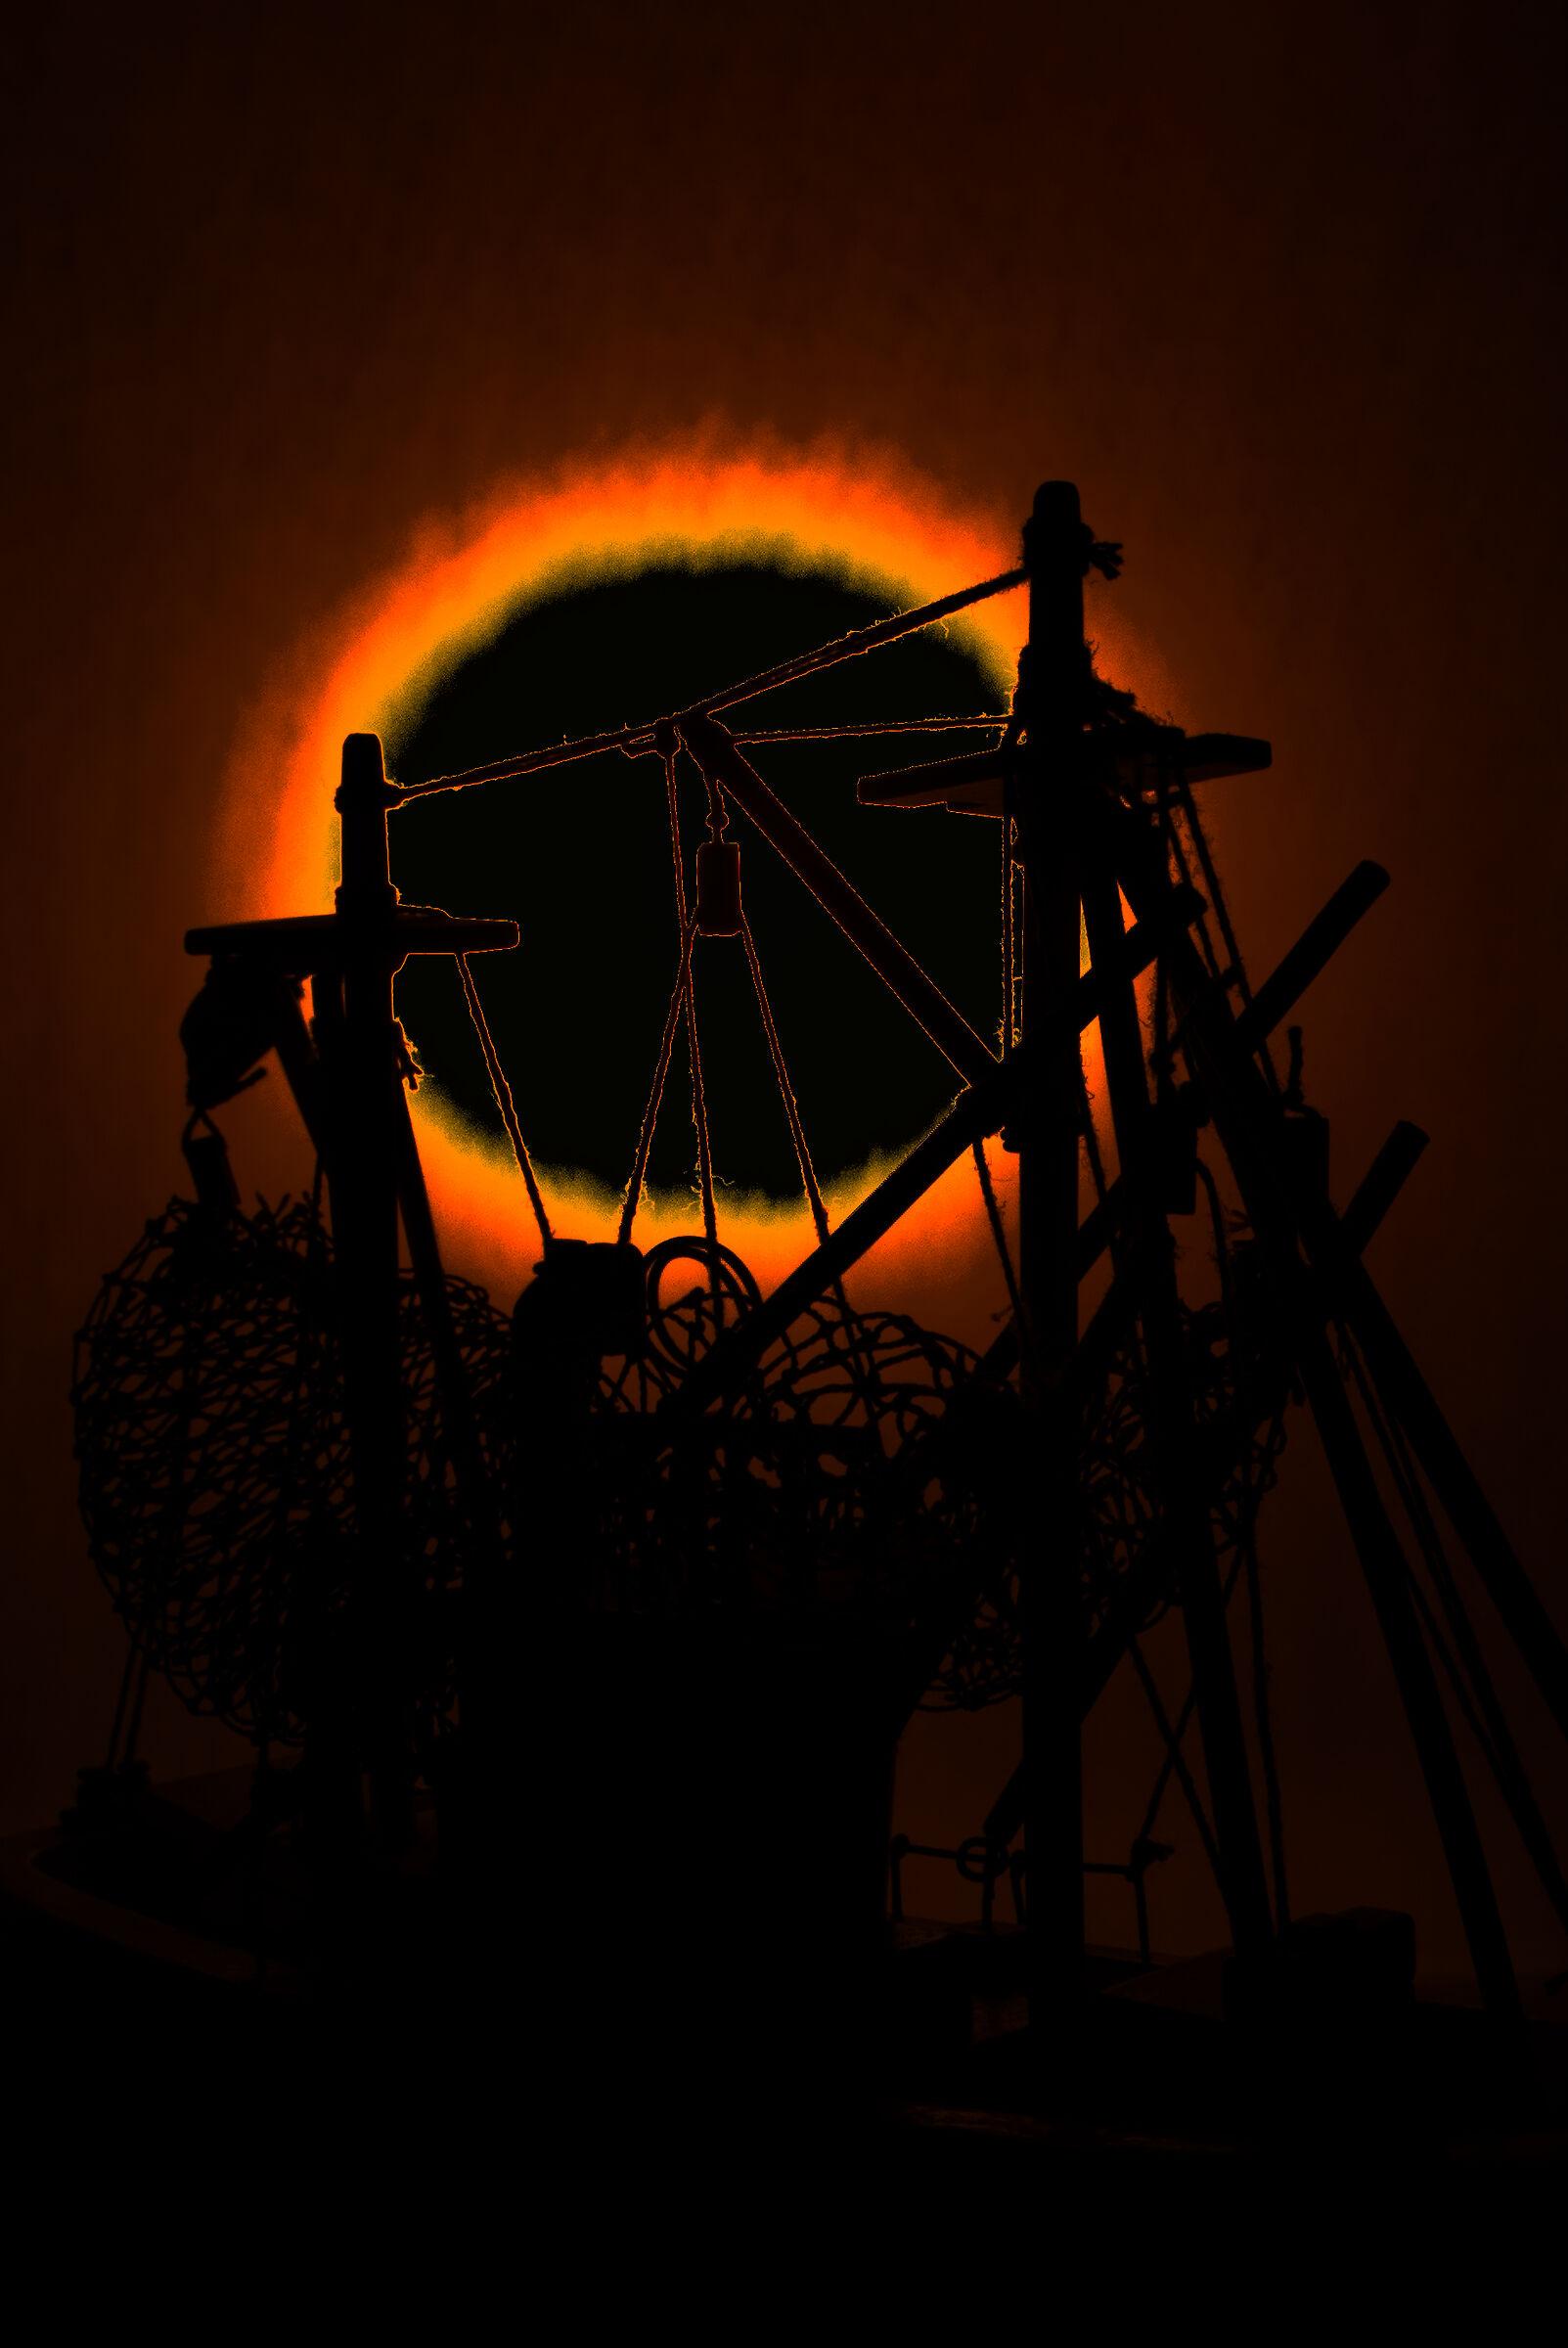 L'eclissi totale...